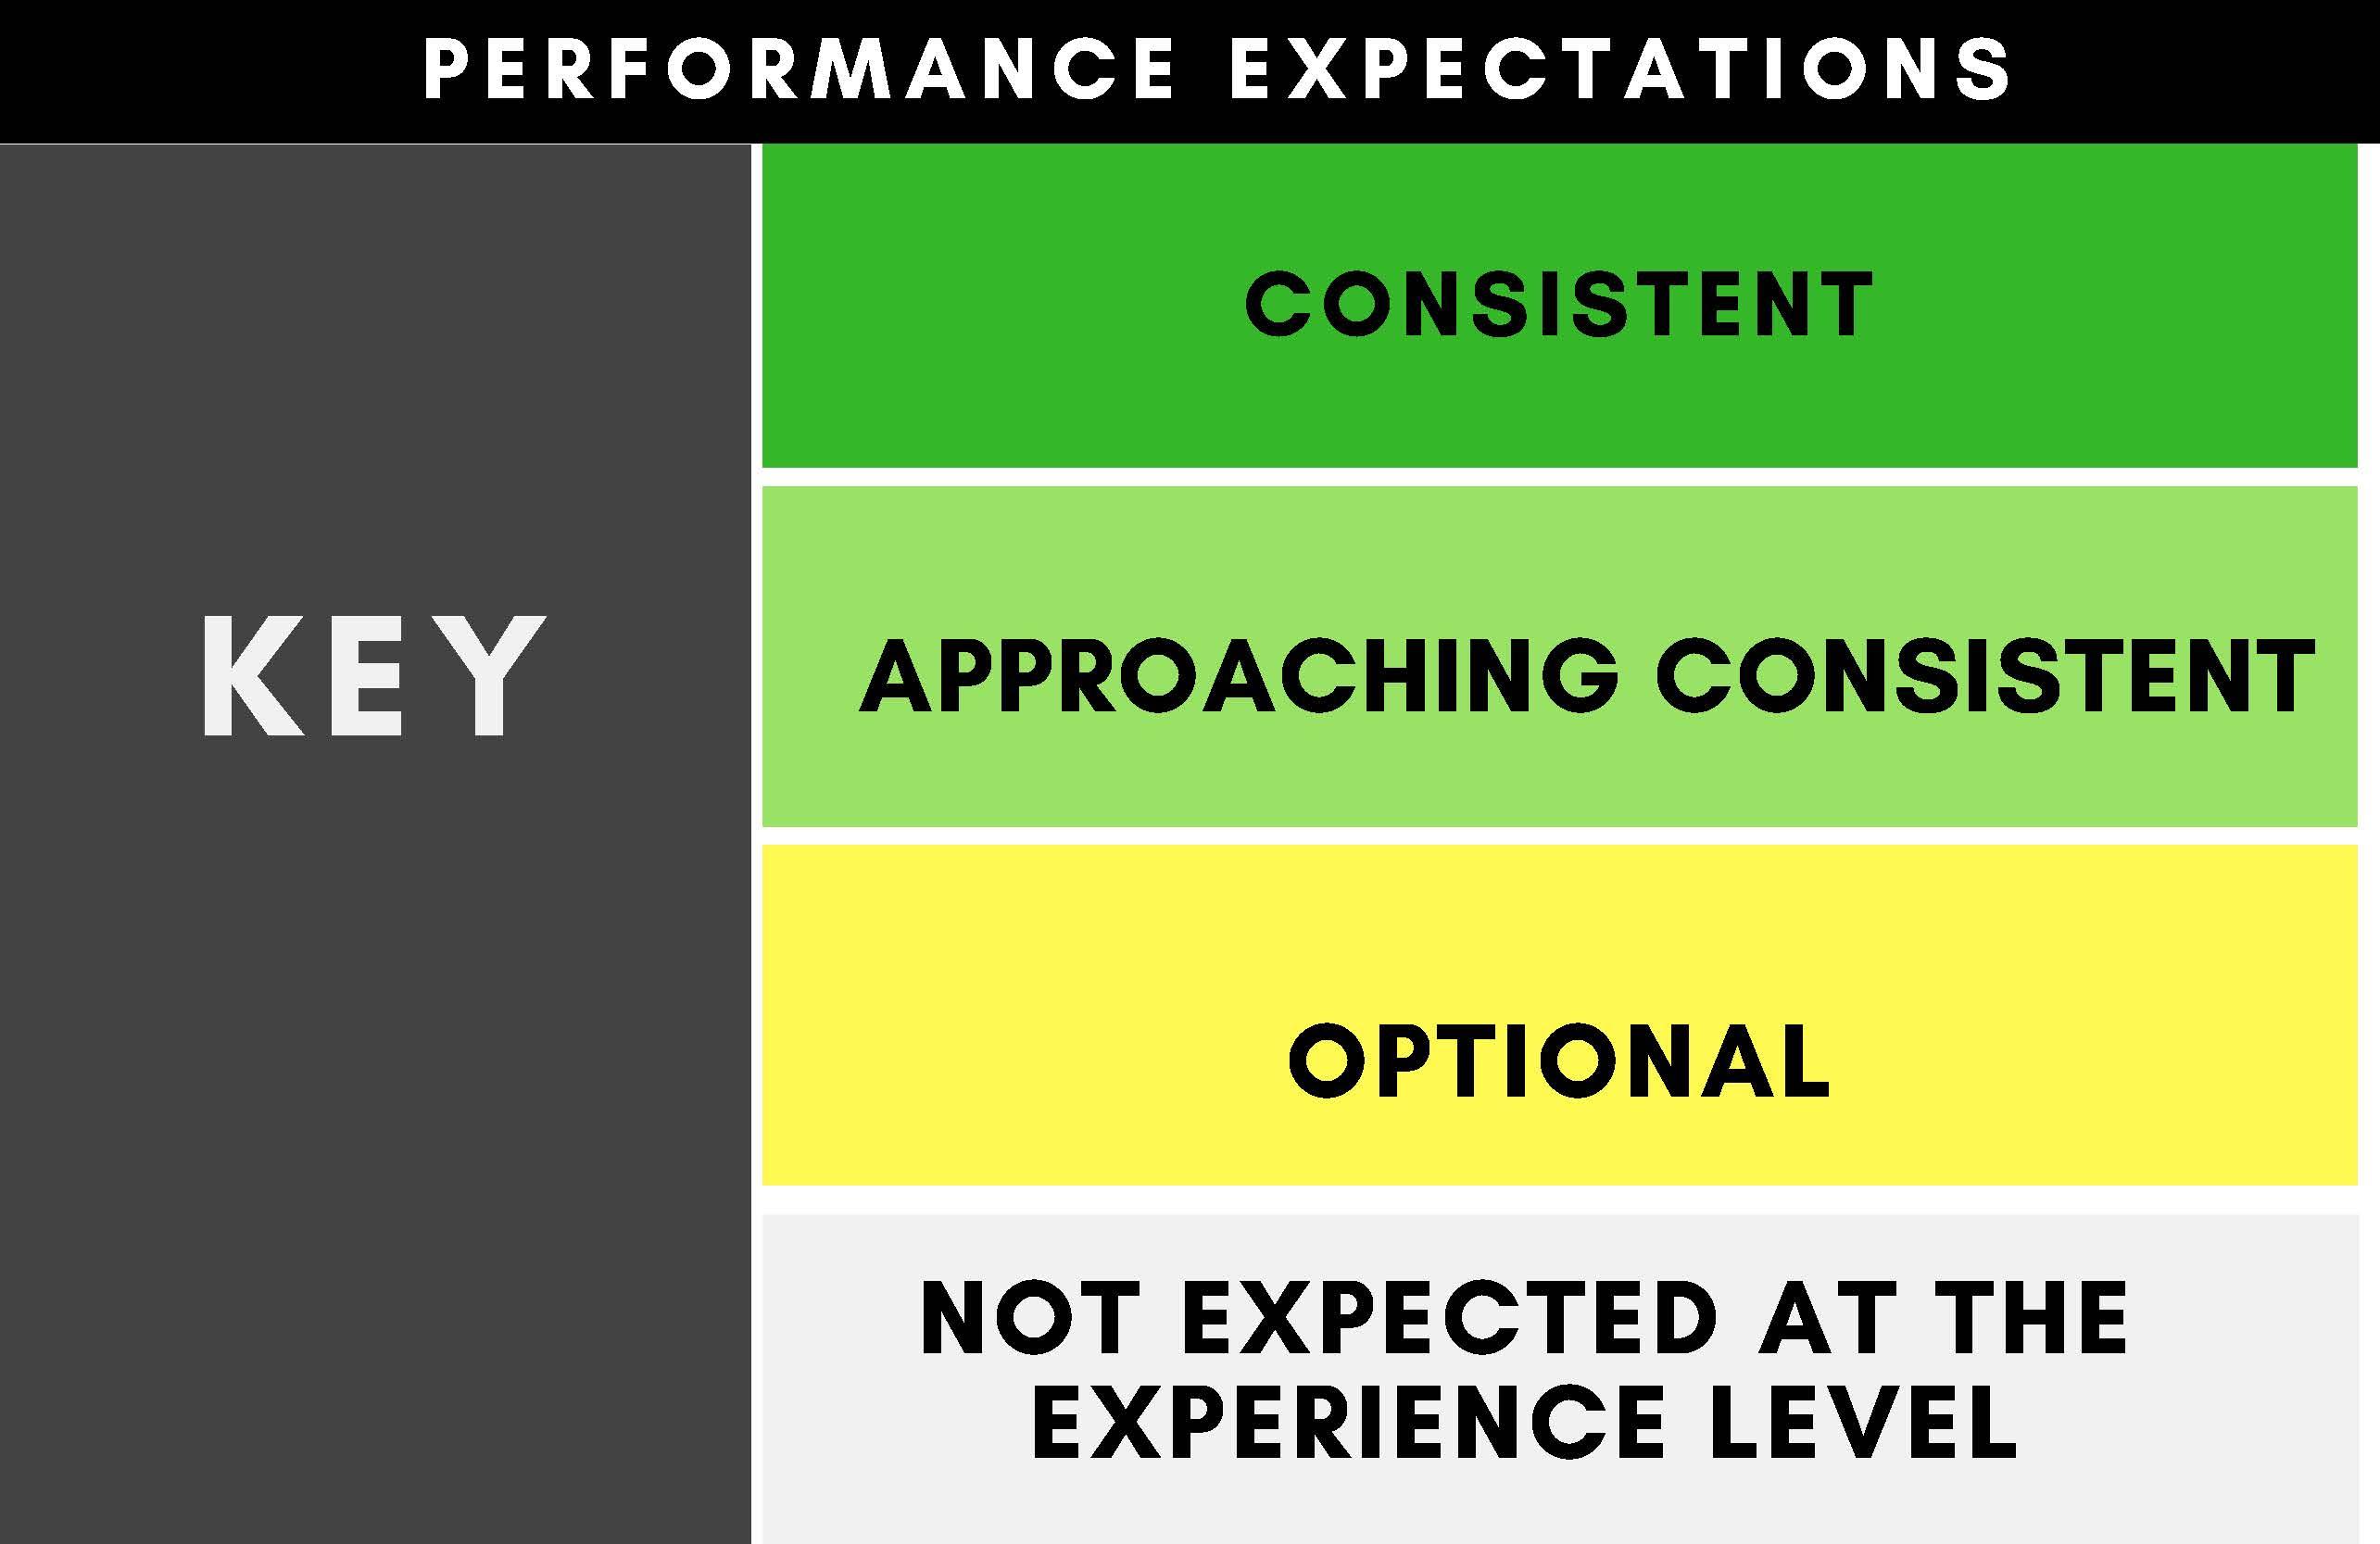 Key_PerformanceExpectations.jpg